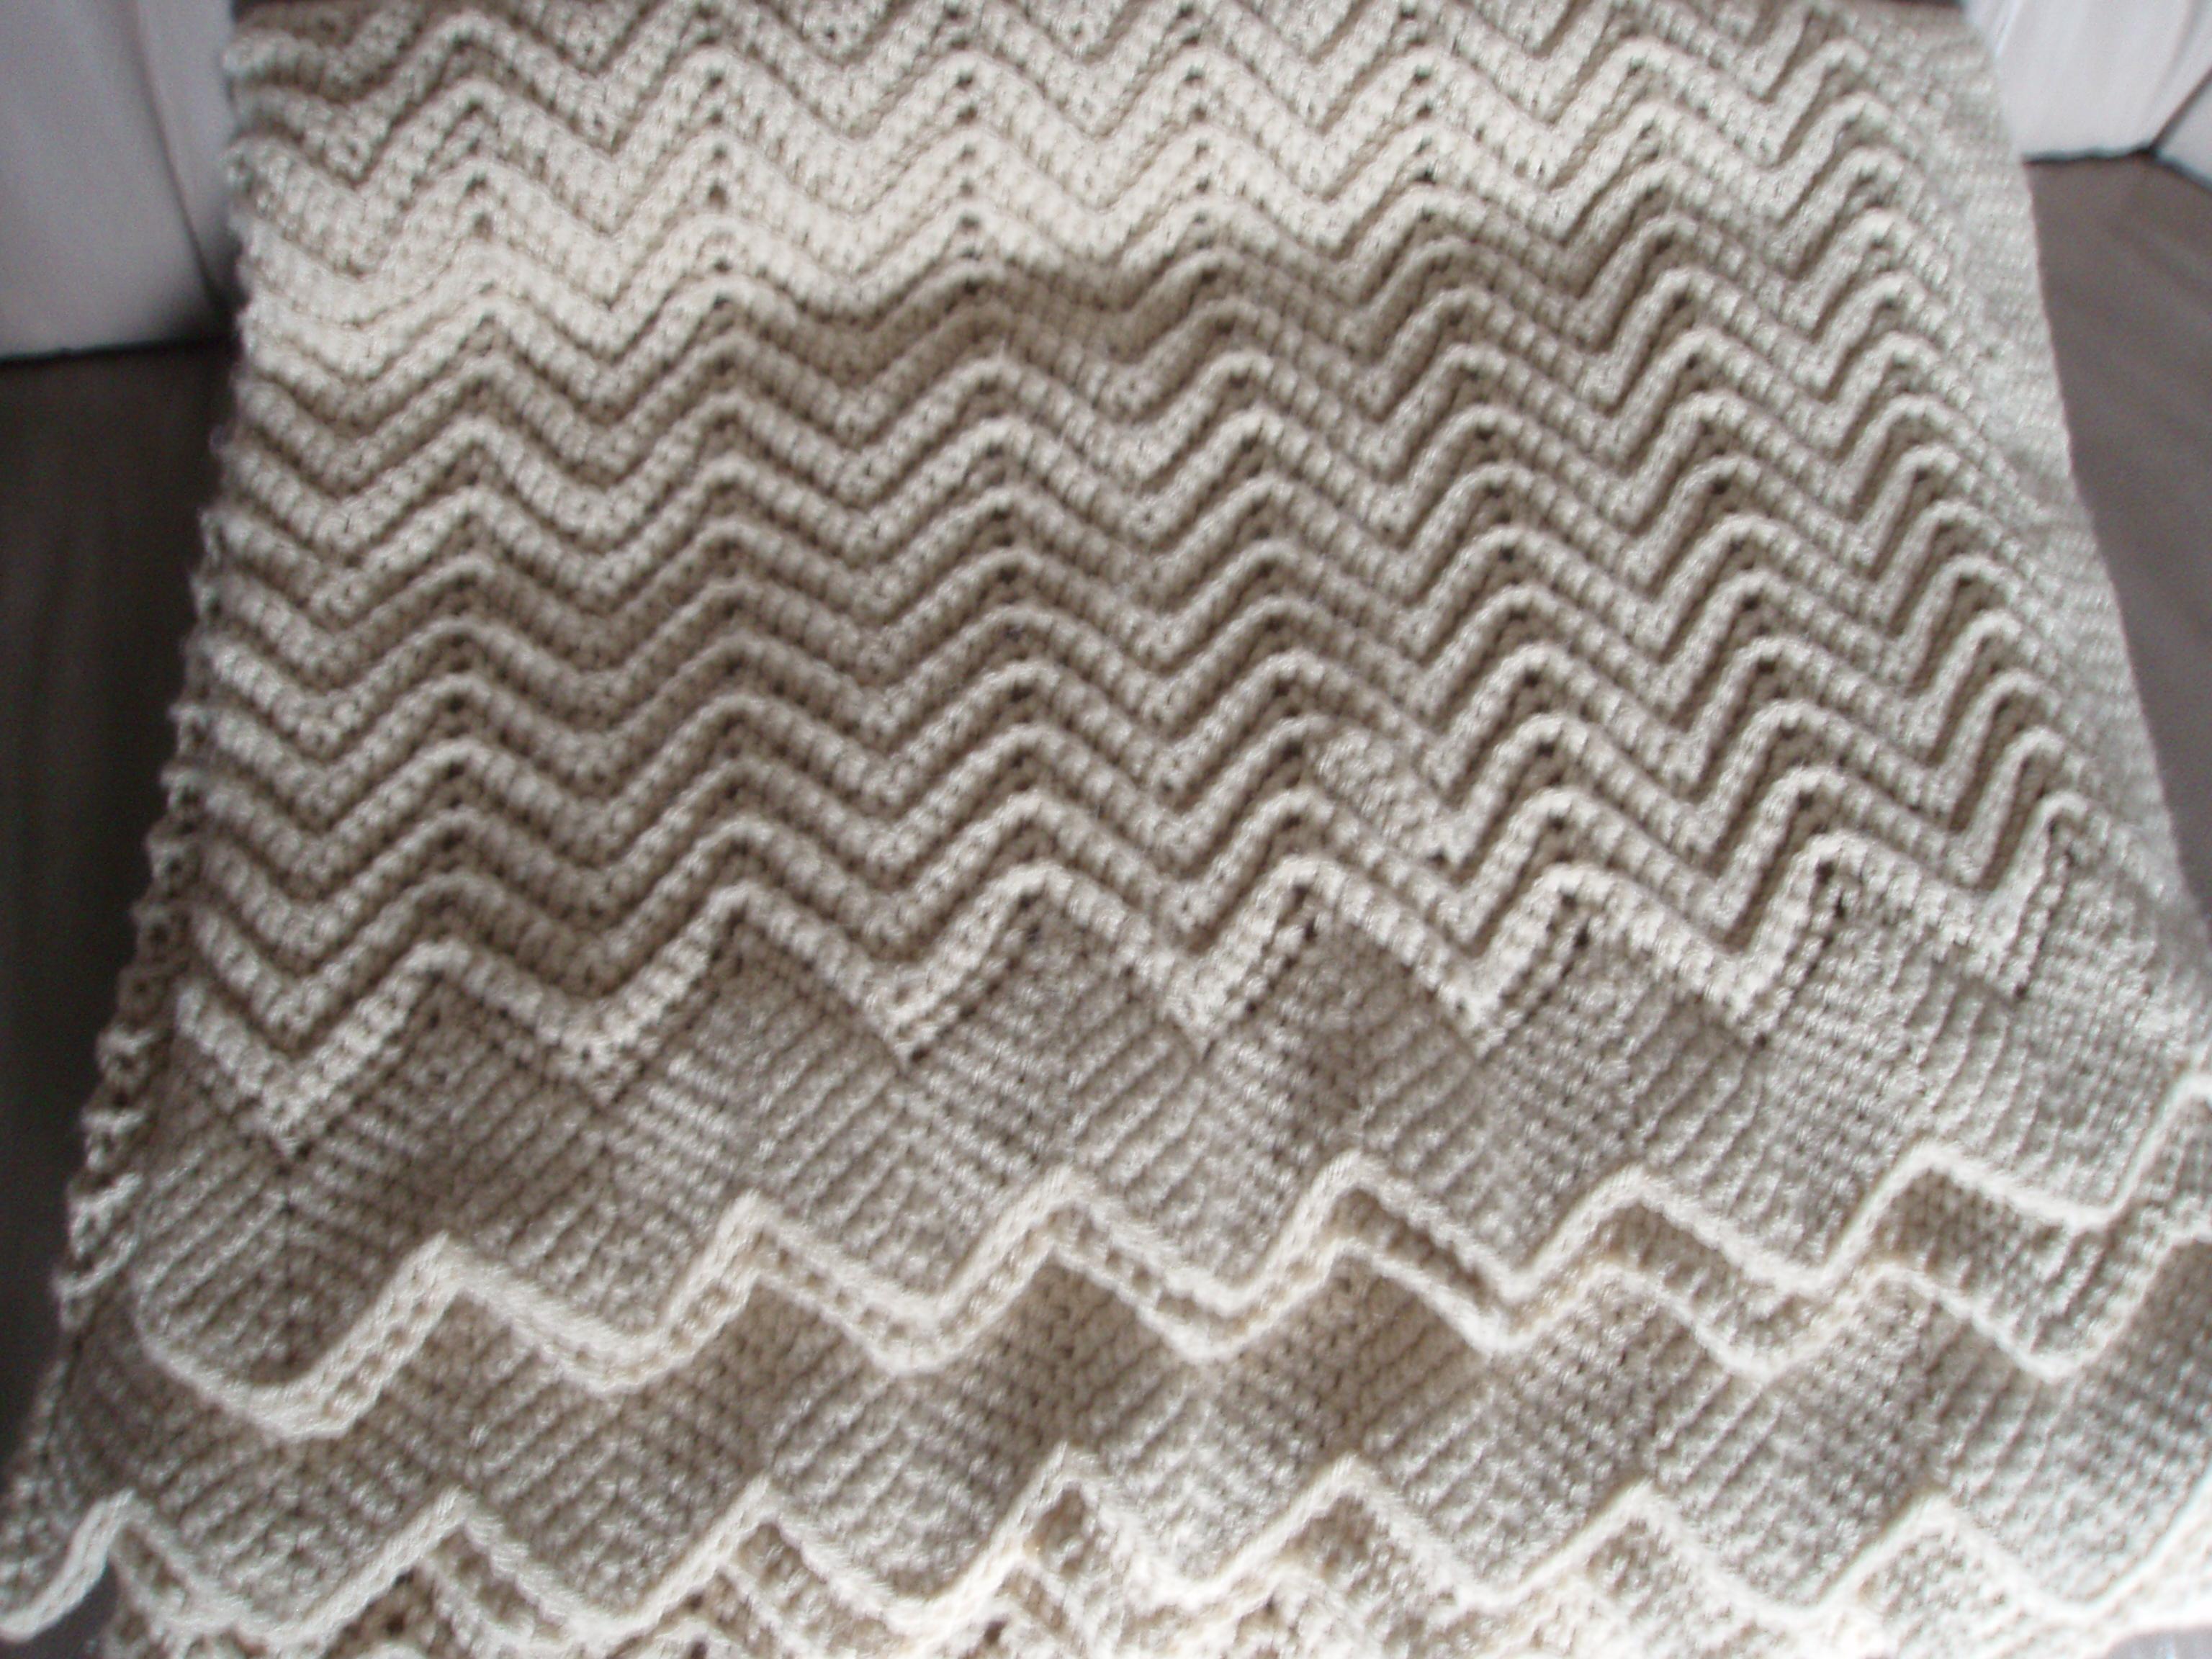 Peggy's blanket